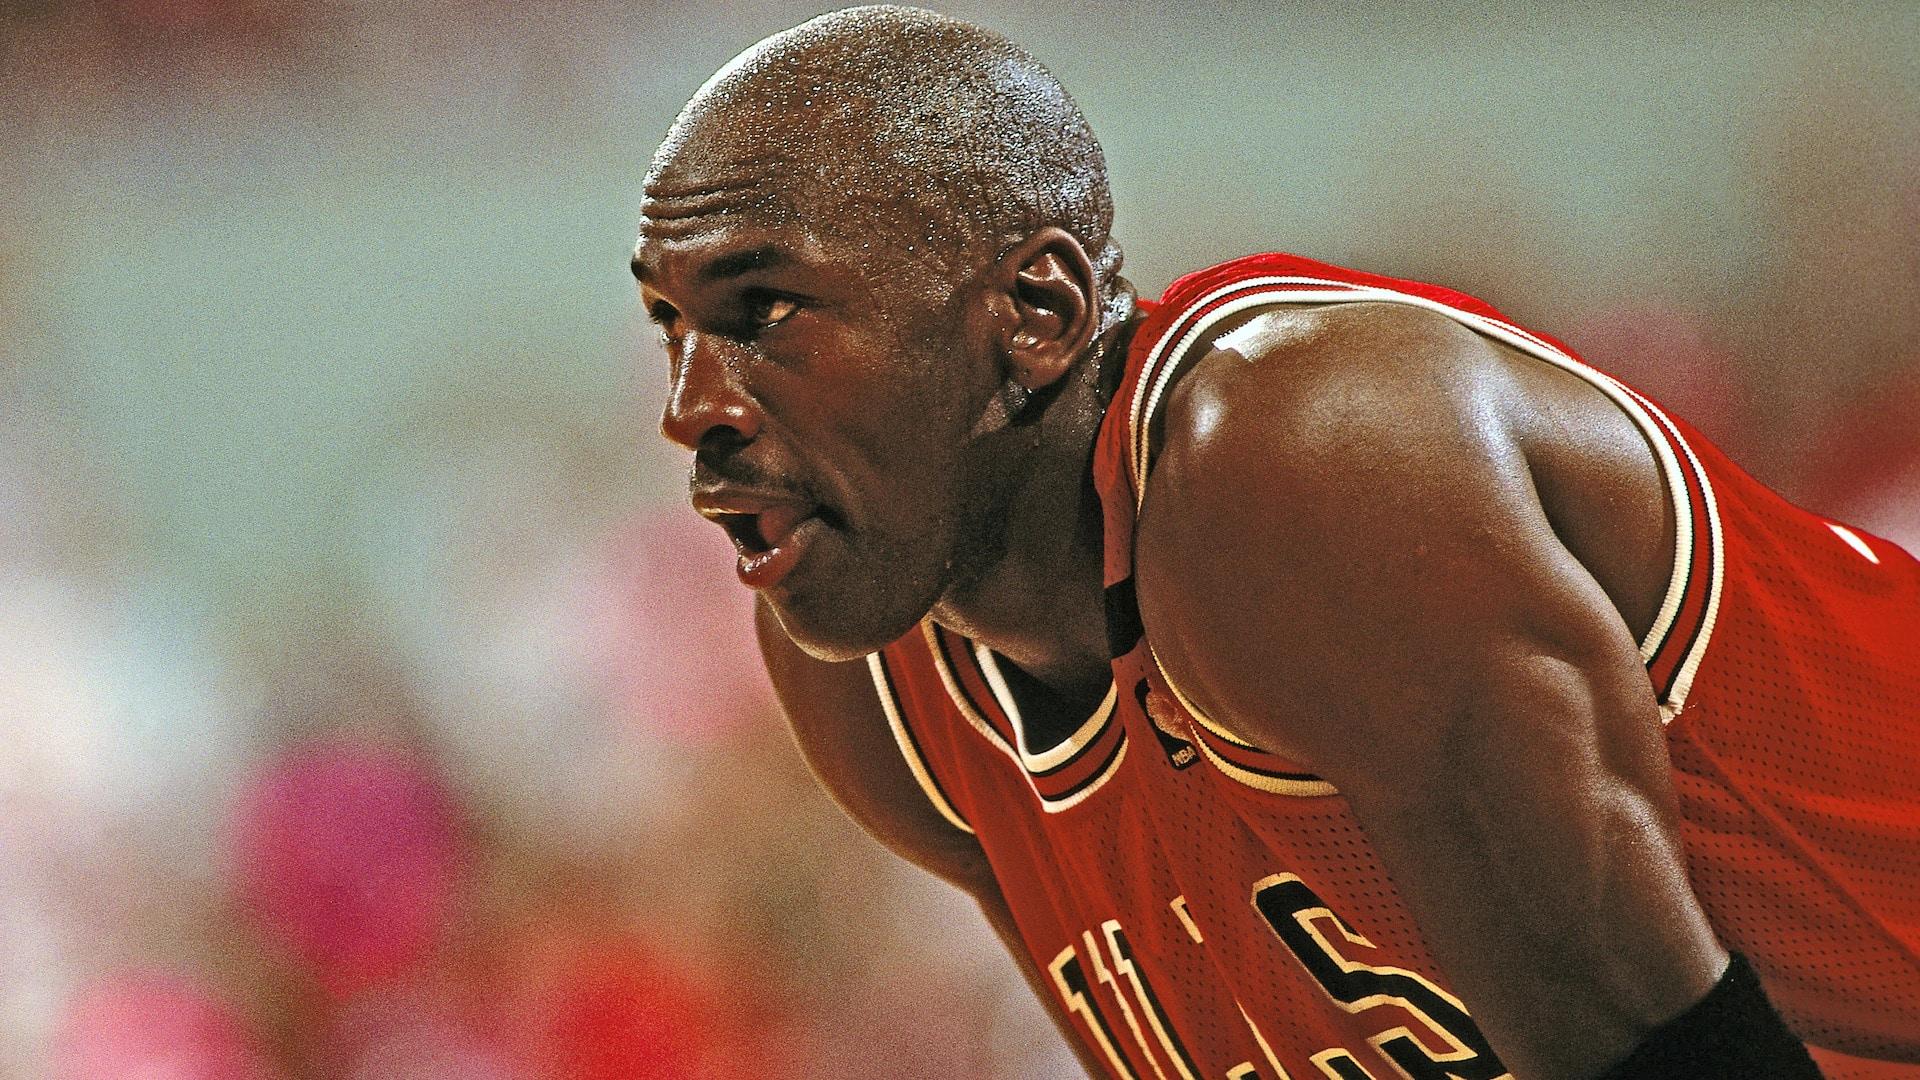 Michael Jordan The Last Dance Arremesso Final